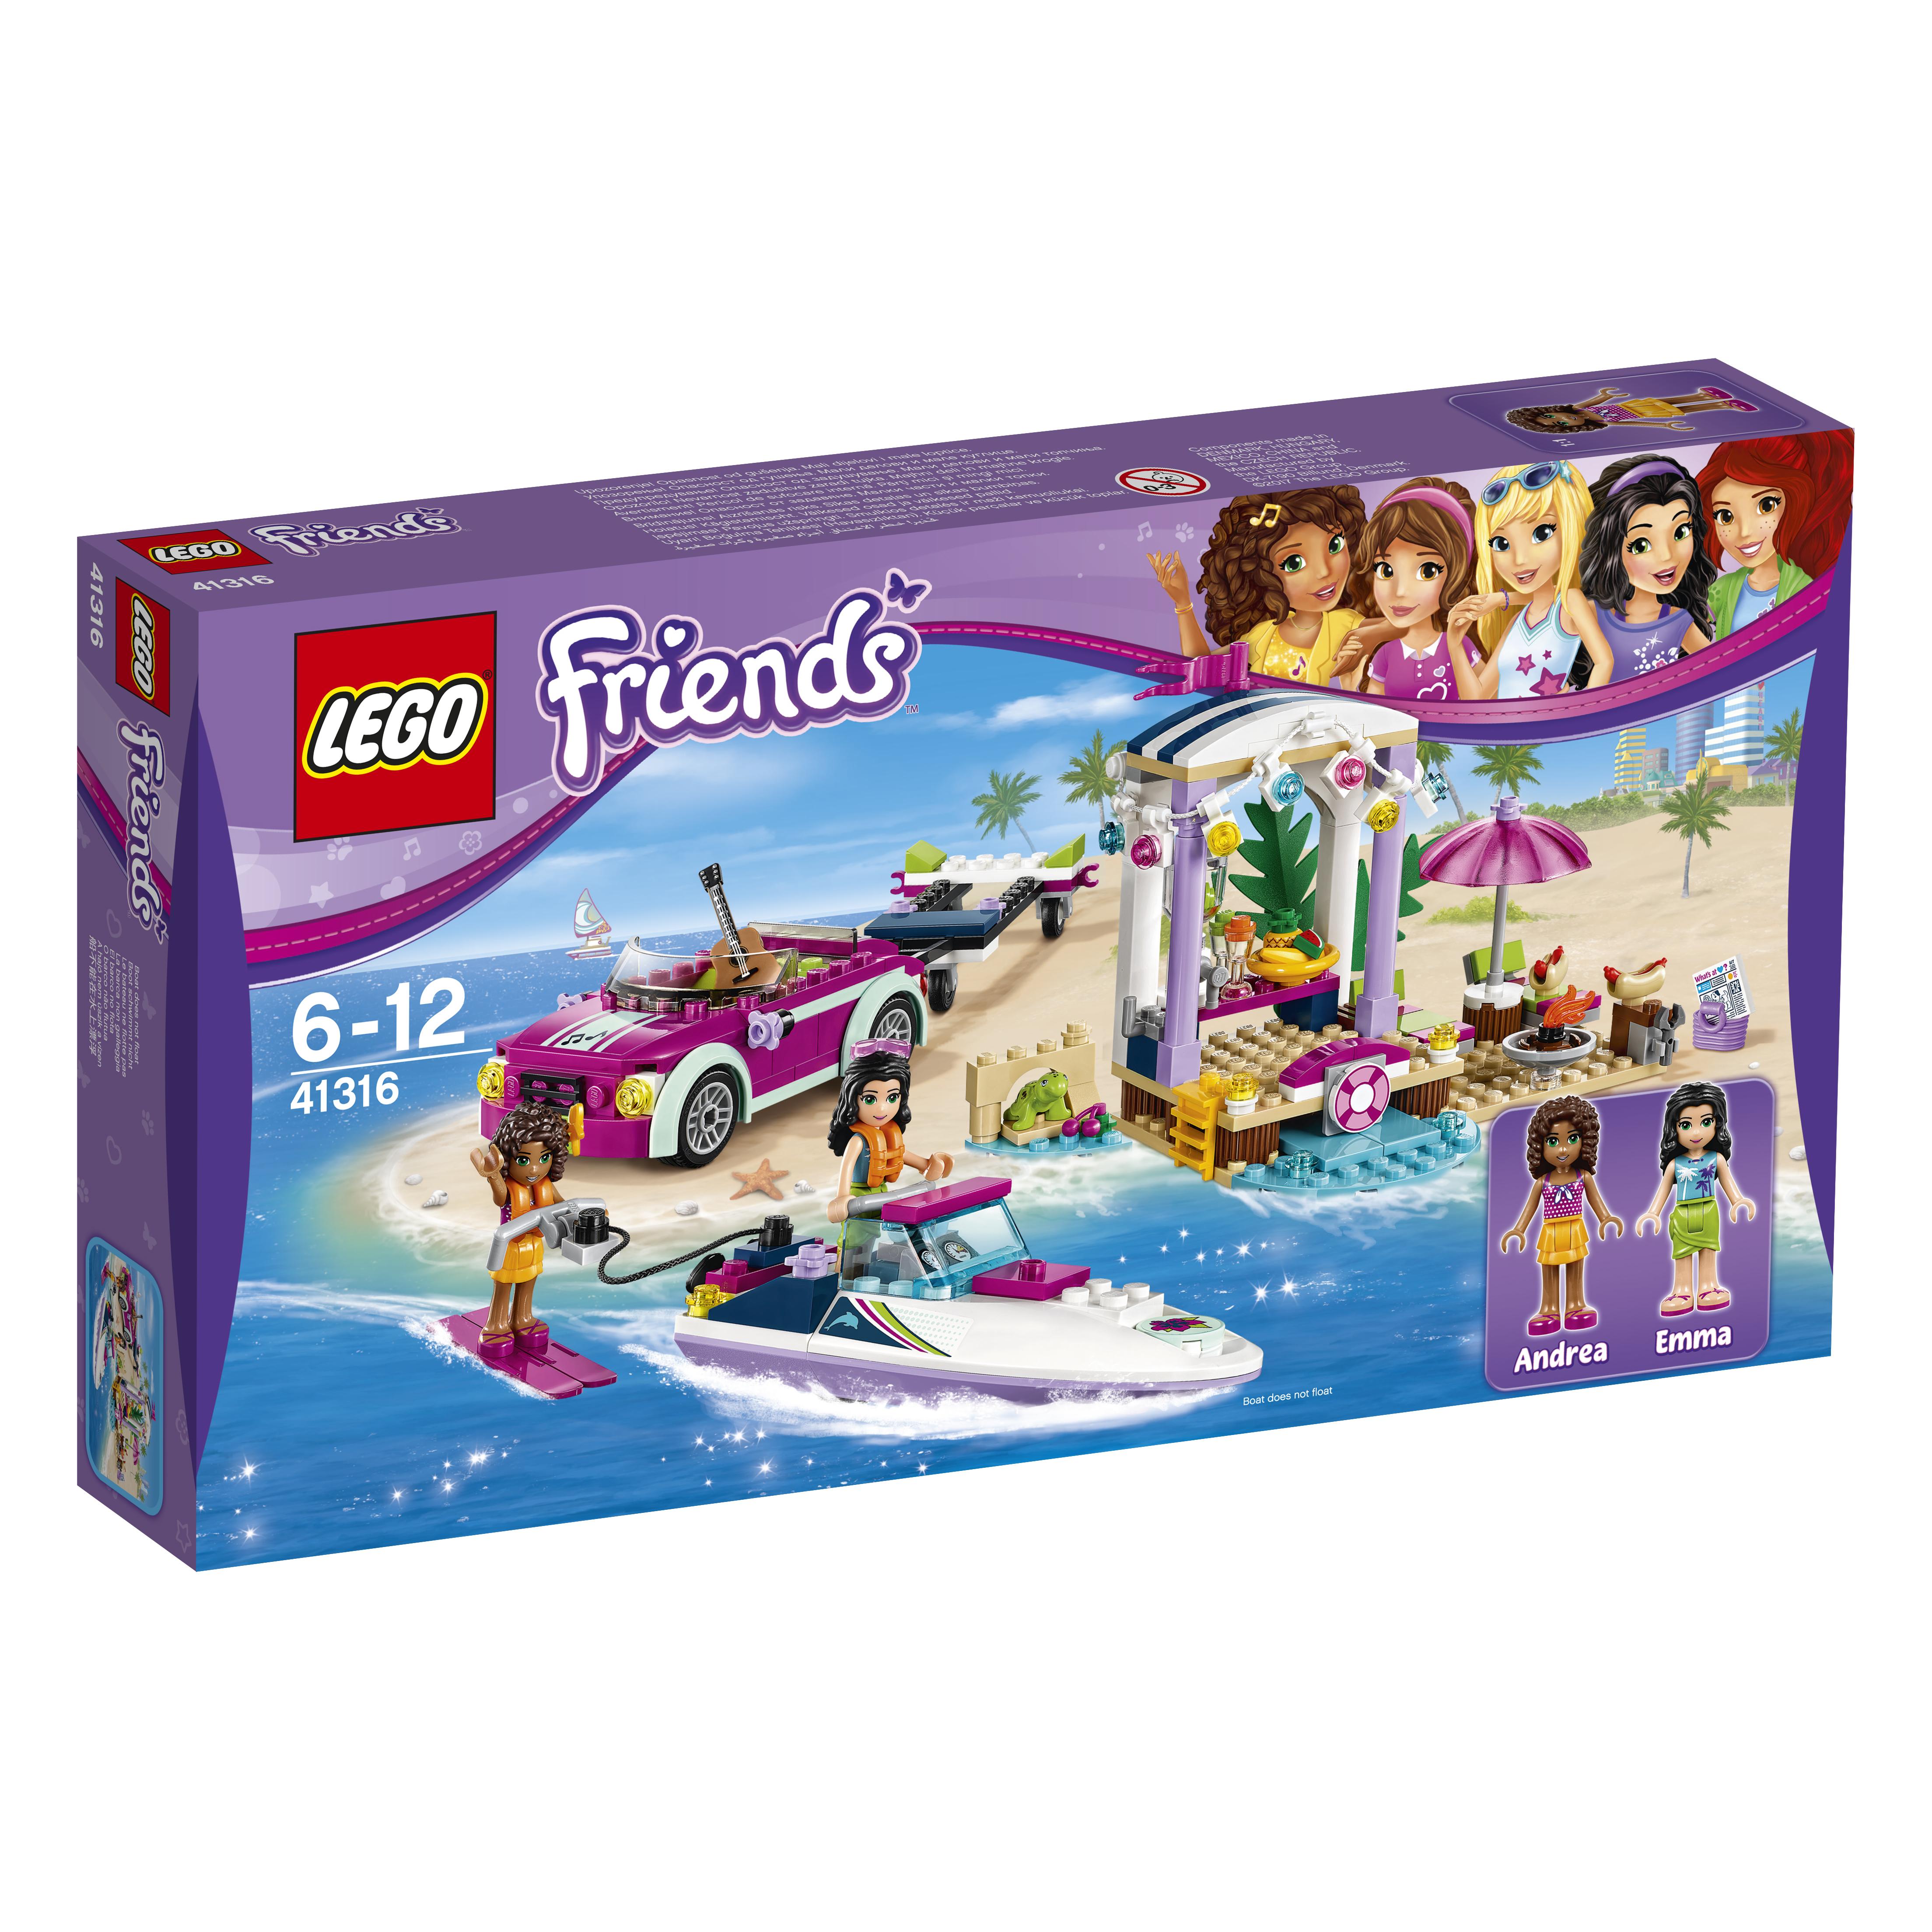 Фото - LEGO LEGO Скоростной катер Андреа lego friends скоростной катер андреа 41316